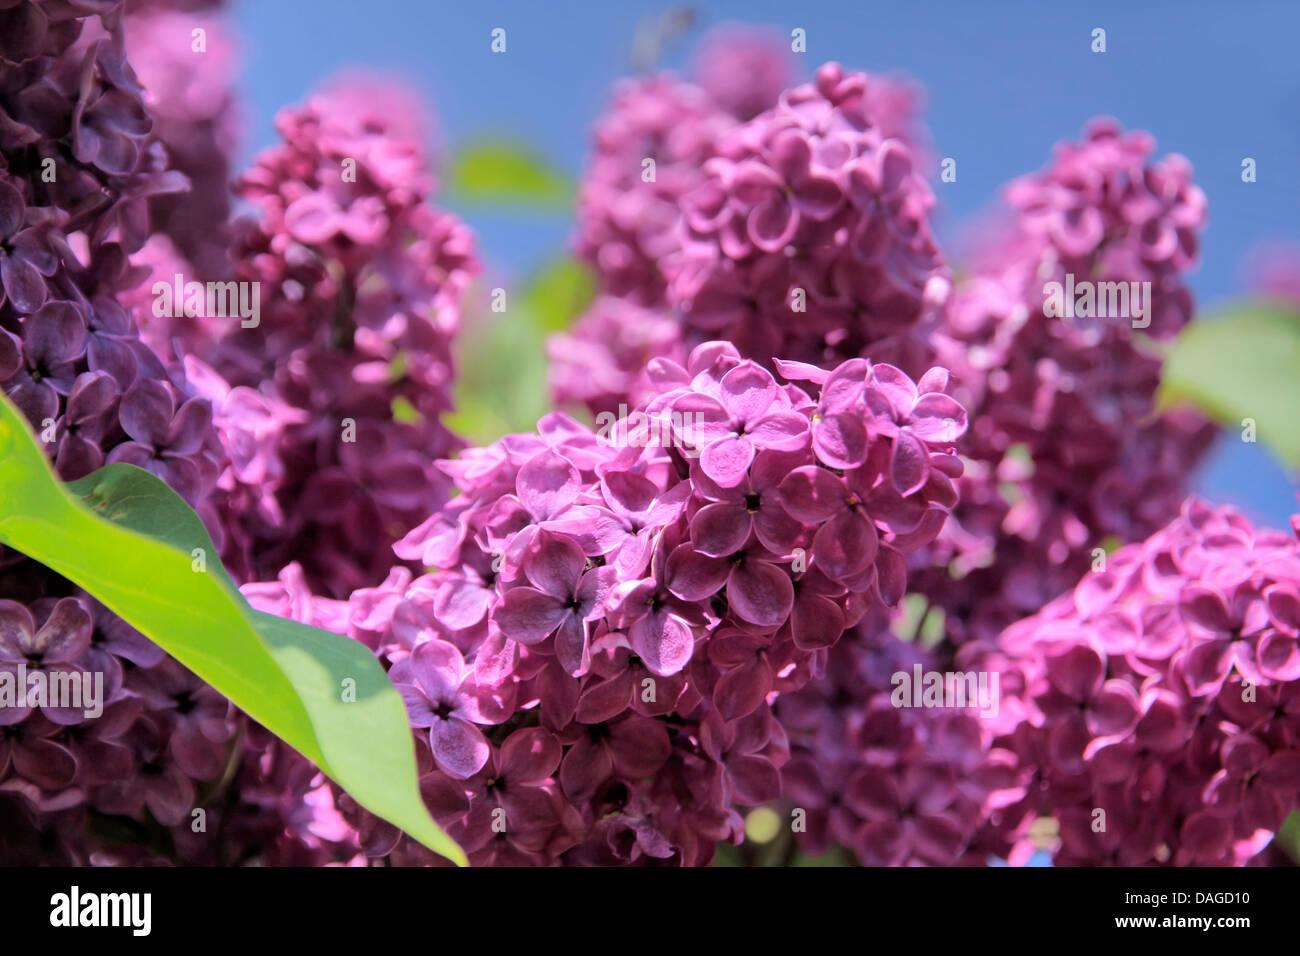 Üppige Blüte lila violett mit blauem Himmel Stockbild